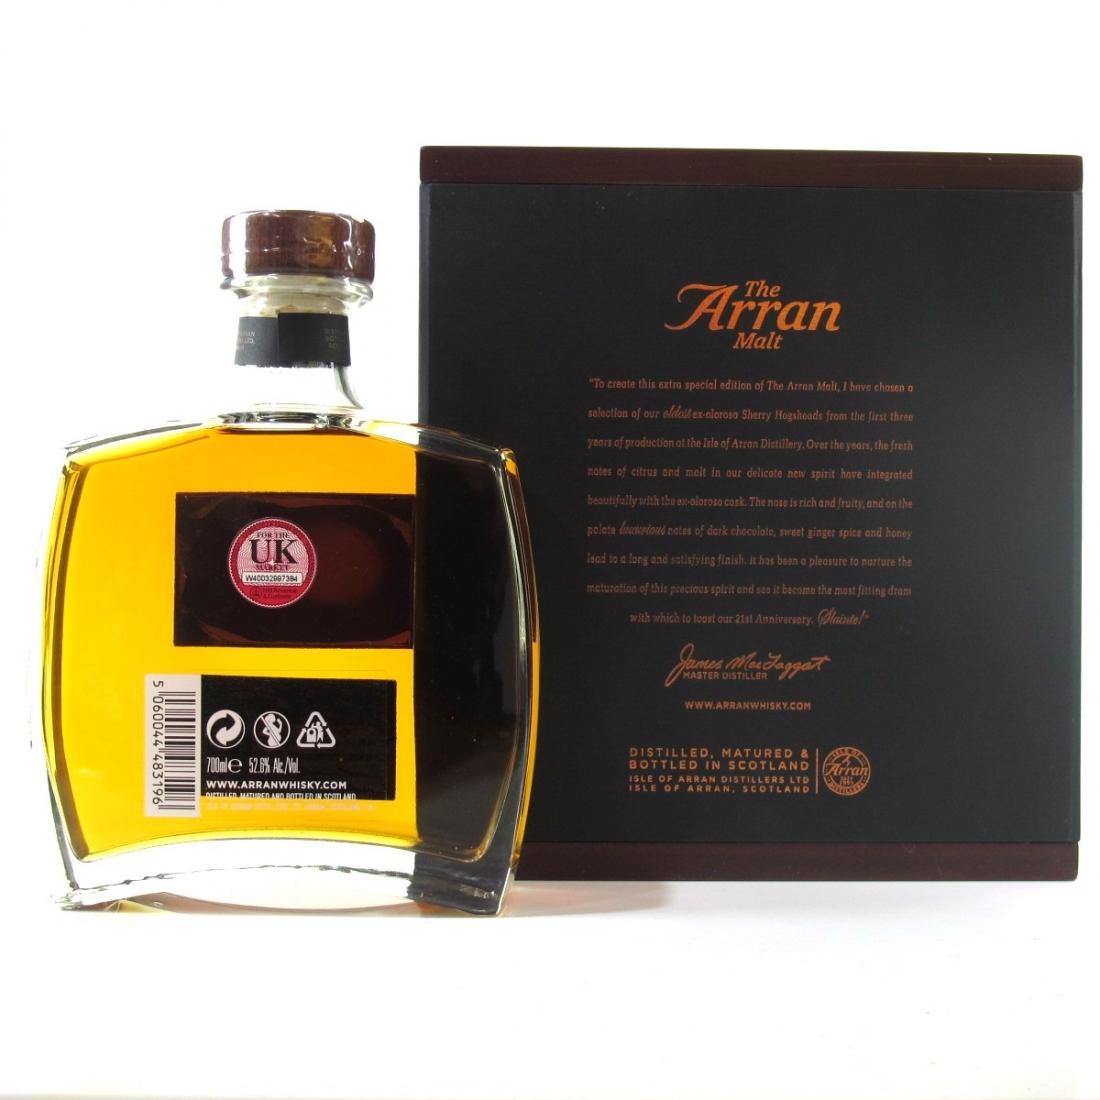 Arran 21st Anniversary Limited Edition